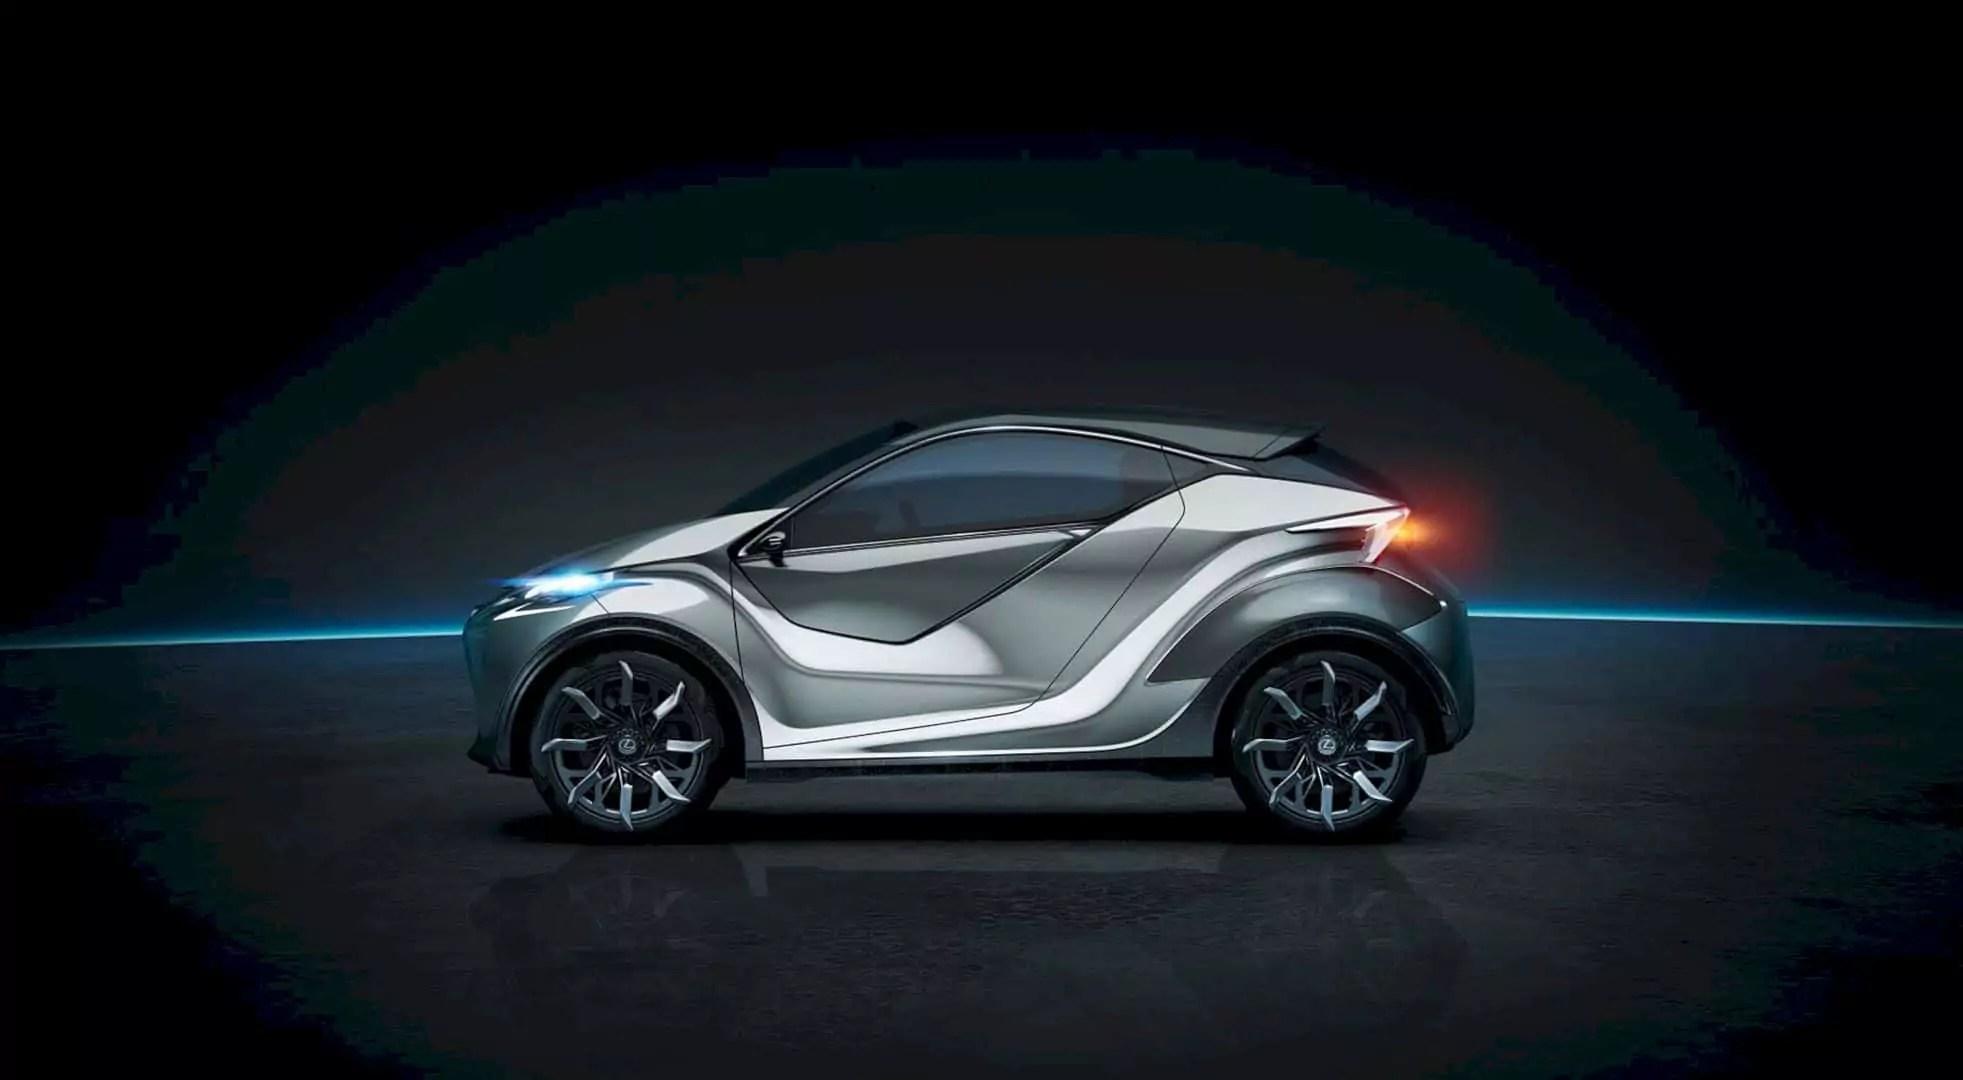 Lexus LF-SA Concept: A New Vision